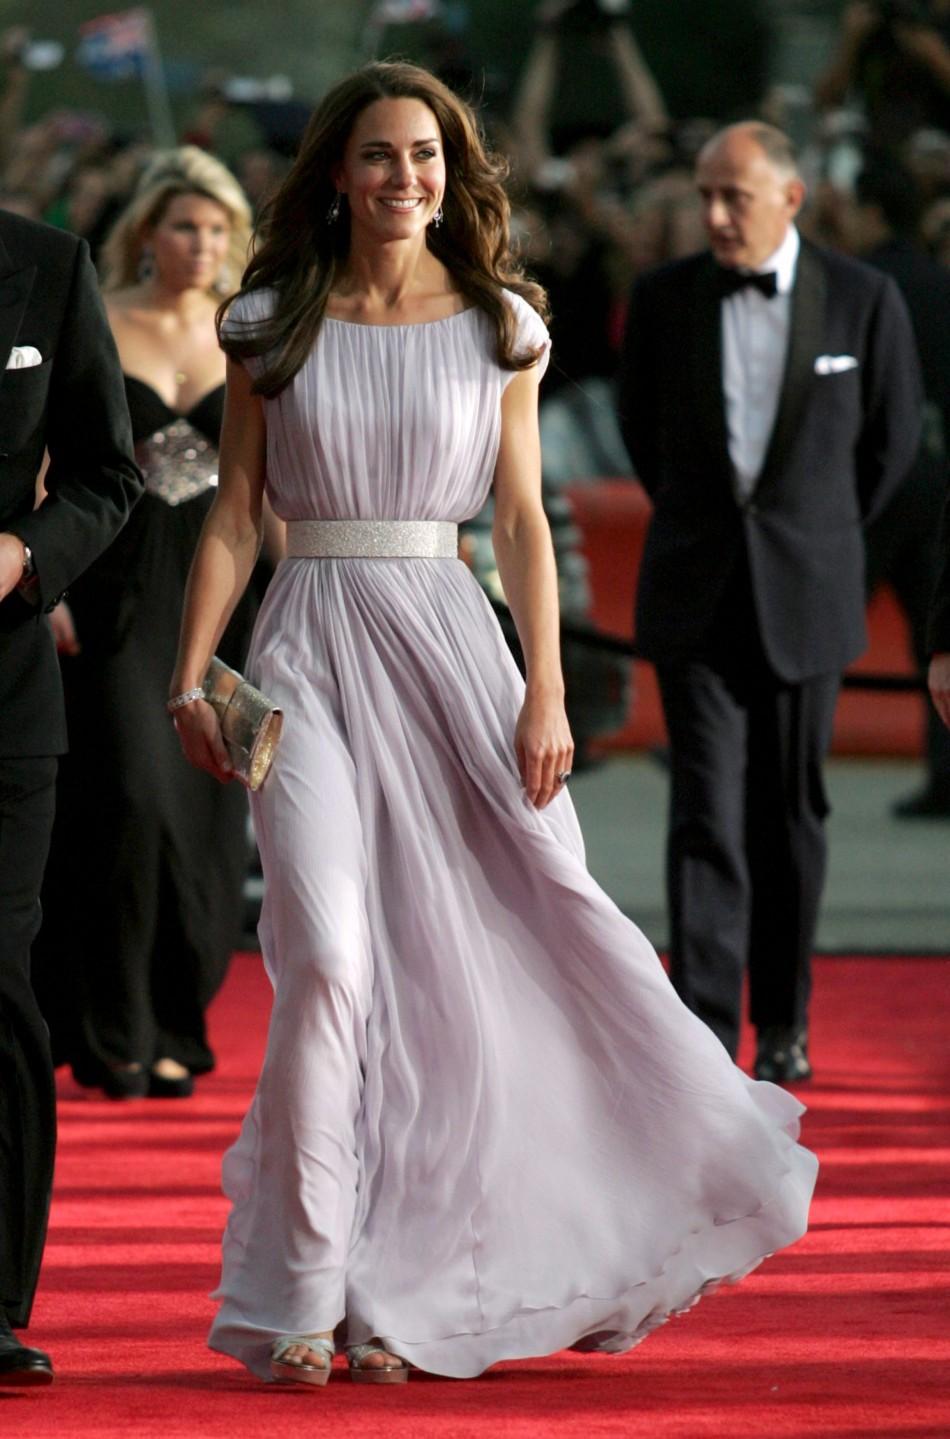 Kate Middleton in Sarah Burton for Alexander McQueen